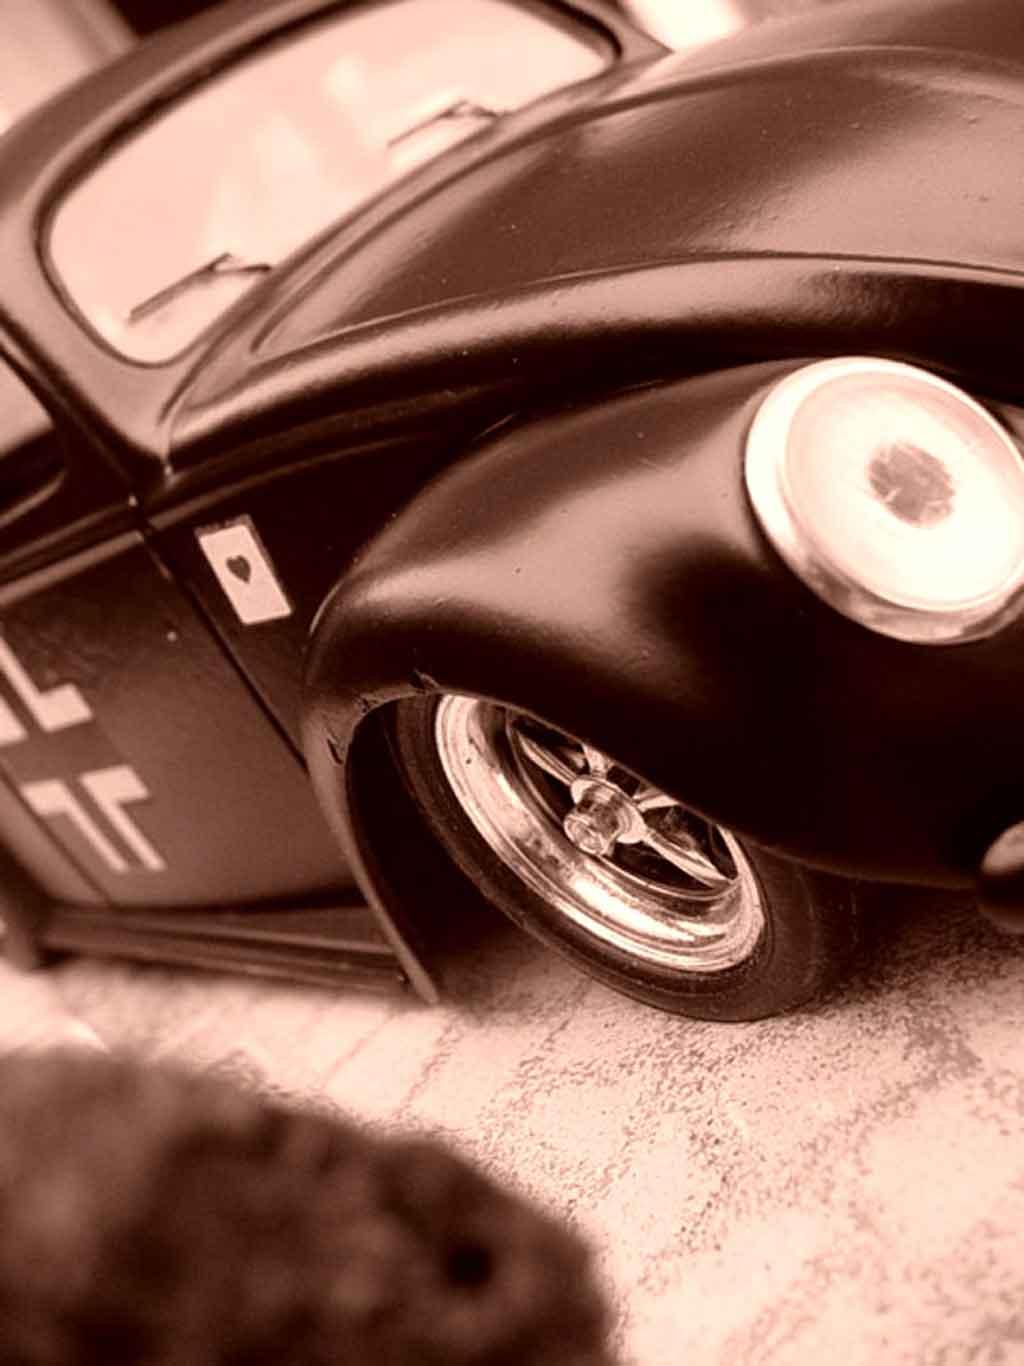 Auto miniature Volkswagen Kafer cox stuka bug tuning Solido. Volkswagen Kafer cox stuka bug miniature 1/18